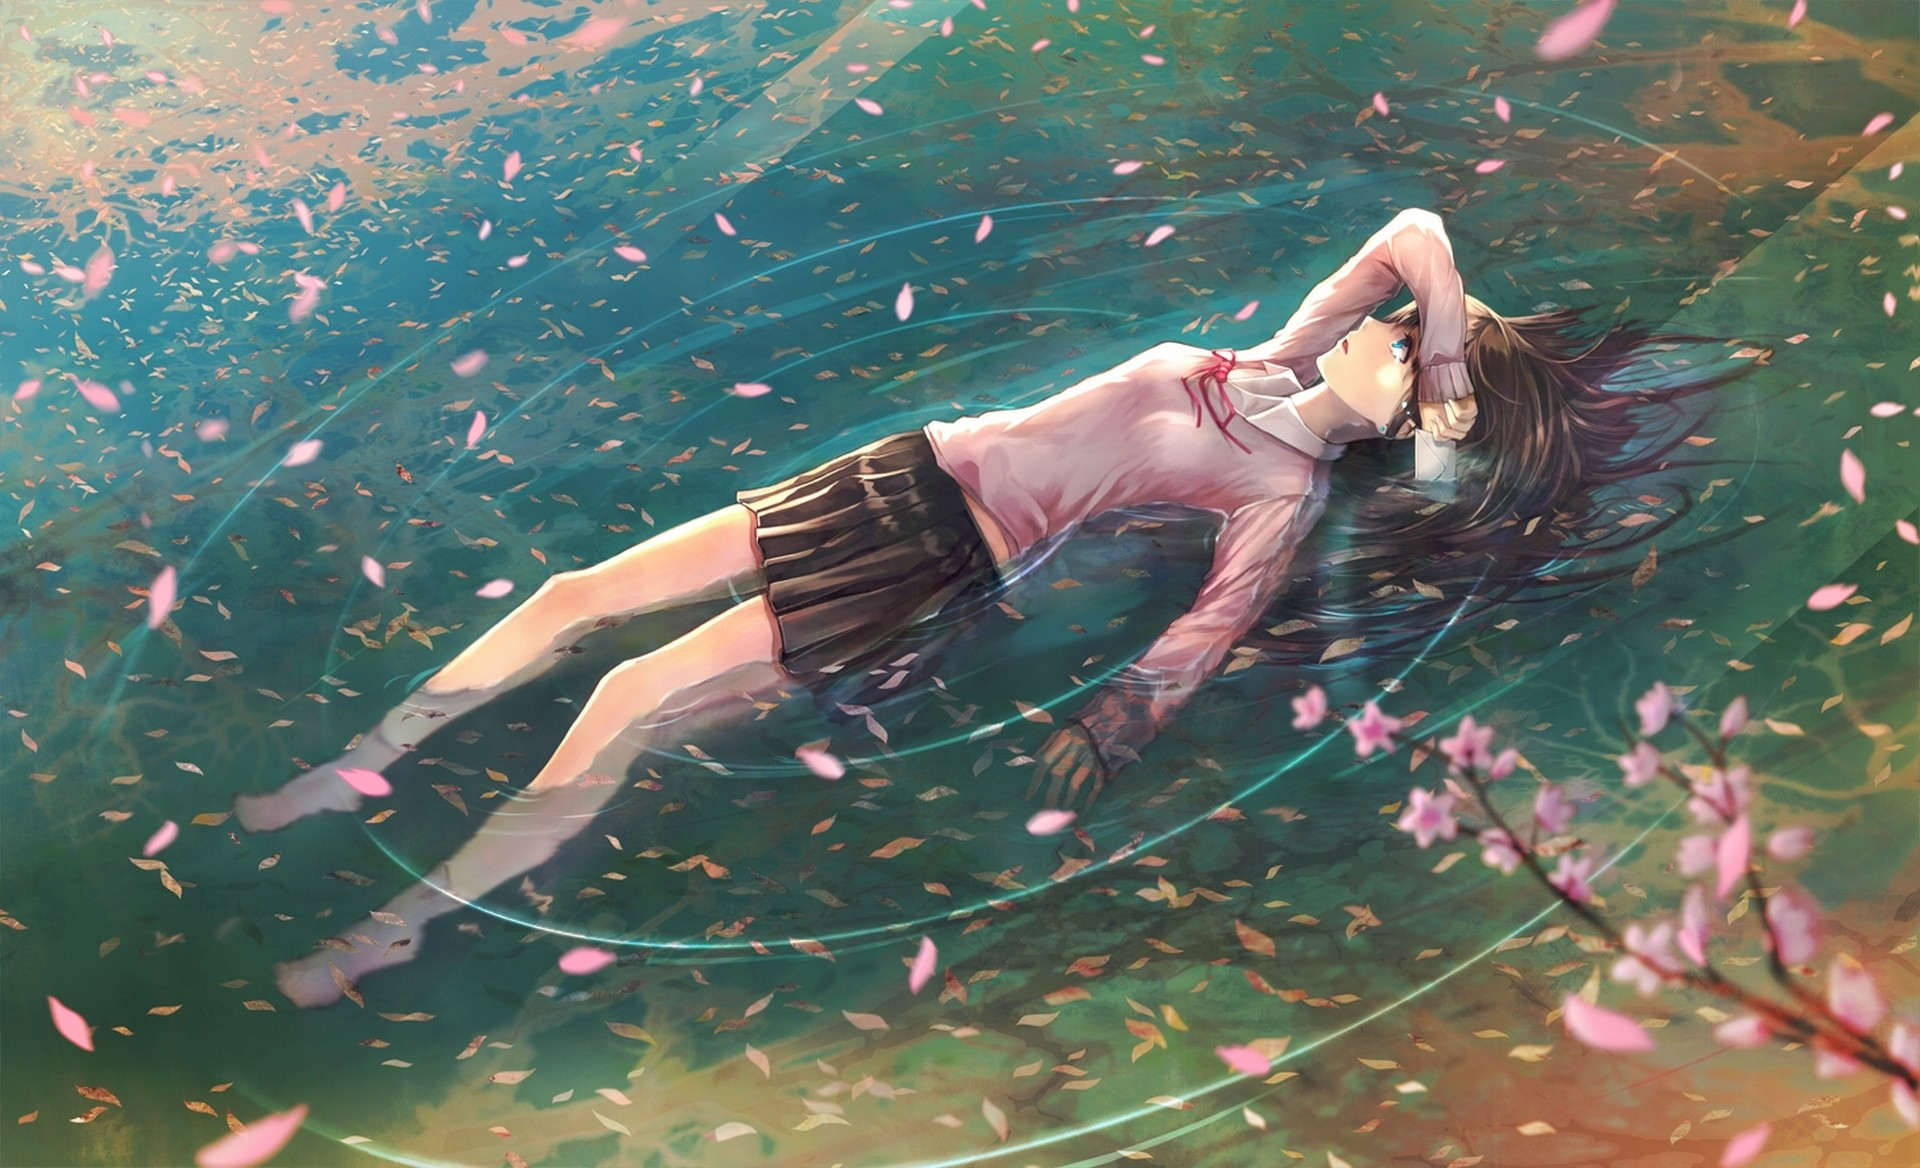 School Uniforms Anime Girls Floating Water Cherry Blossom